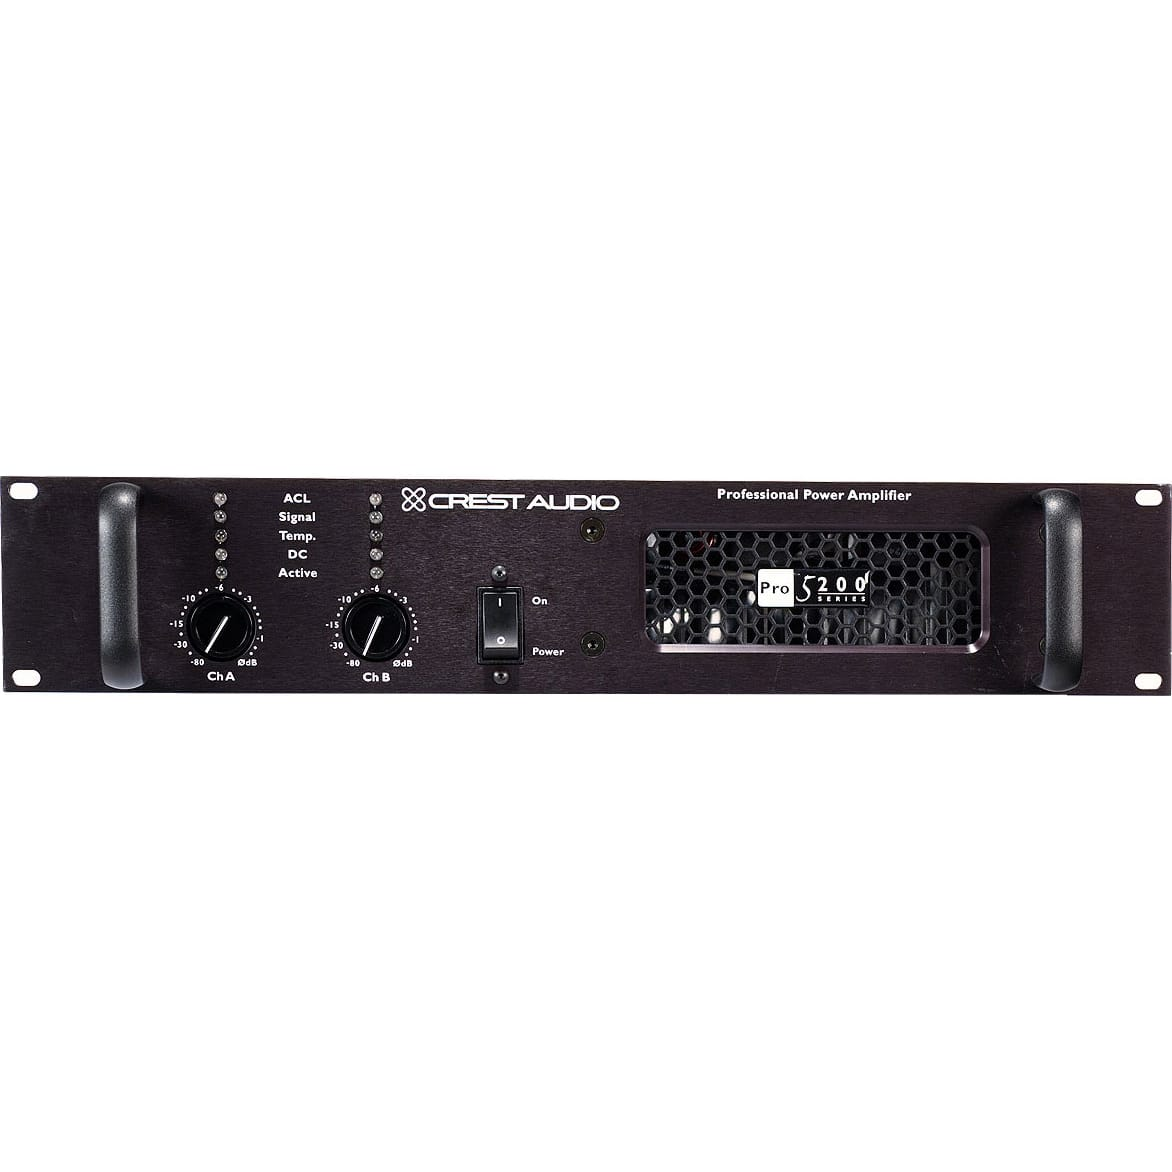 Crest Audio Pro 5200 - 290W @ 8 Ohms Stereo / 1700W @ 8 Ohms bridged stereo amplifier.